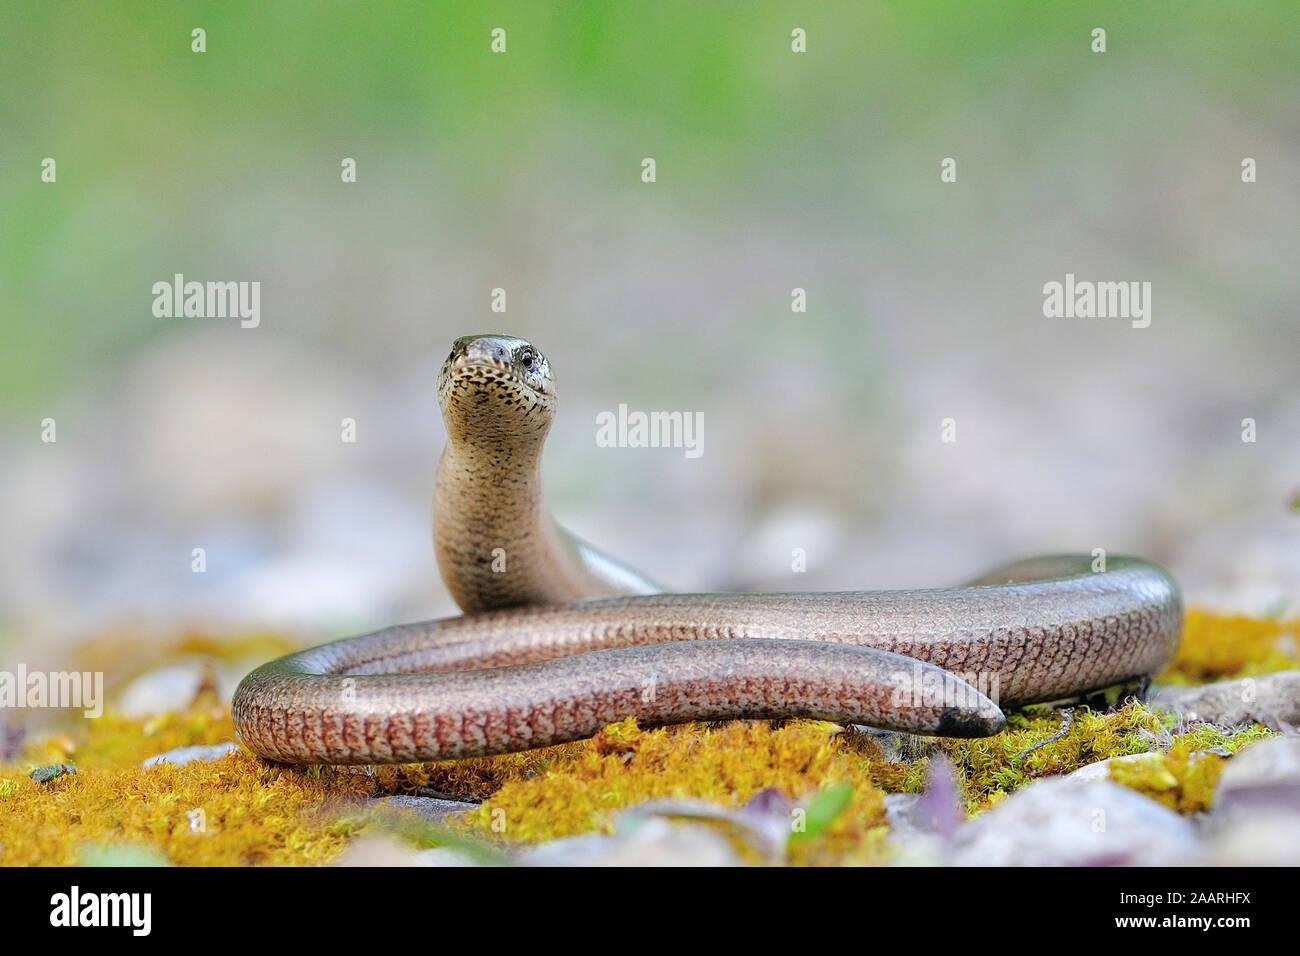 Blindschleiche, (Anguis fragilis) Stock Photo